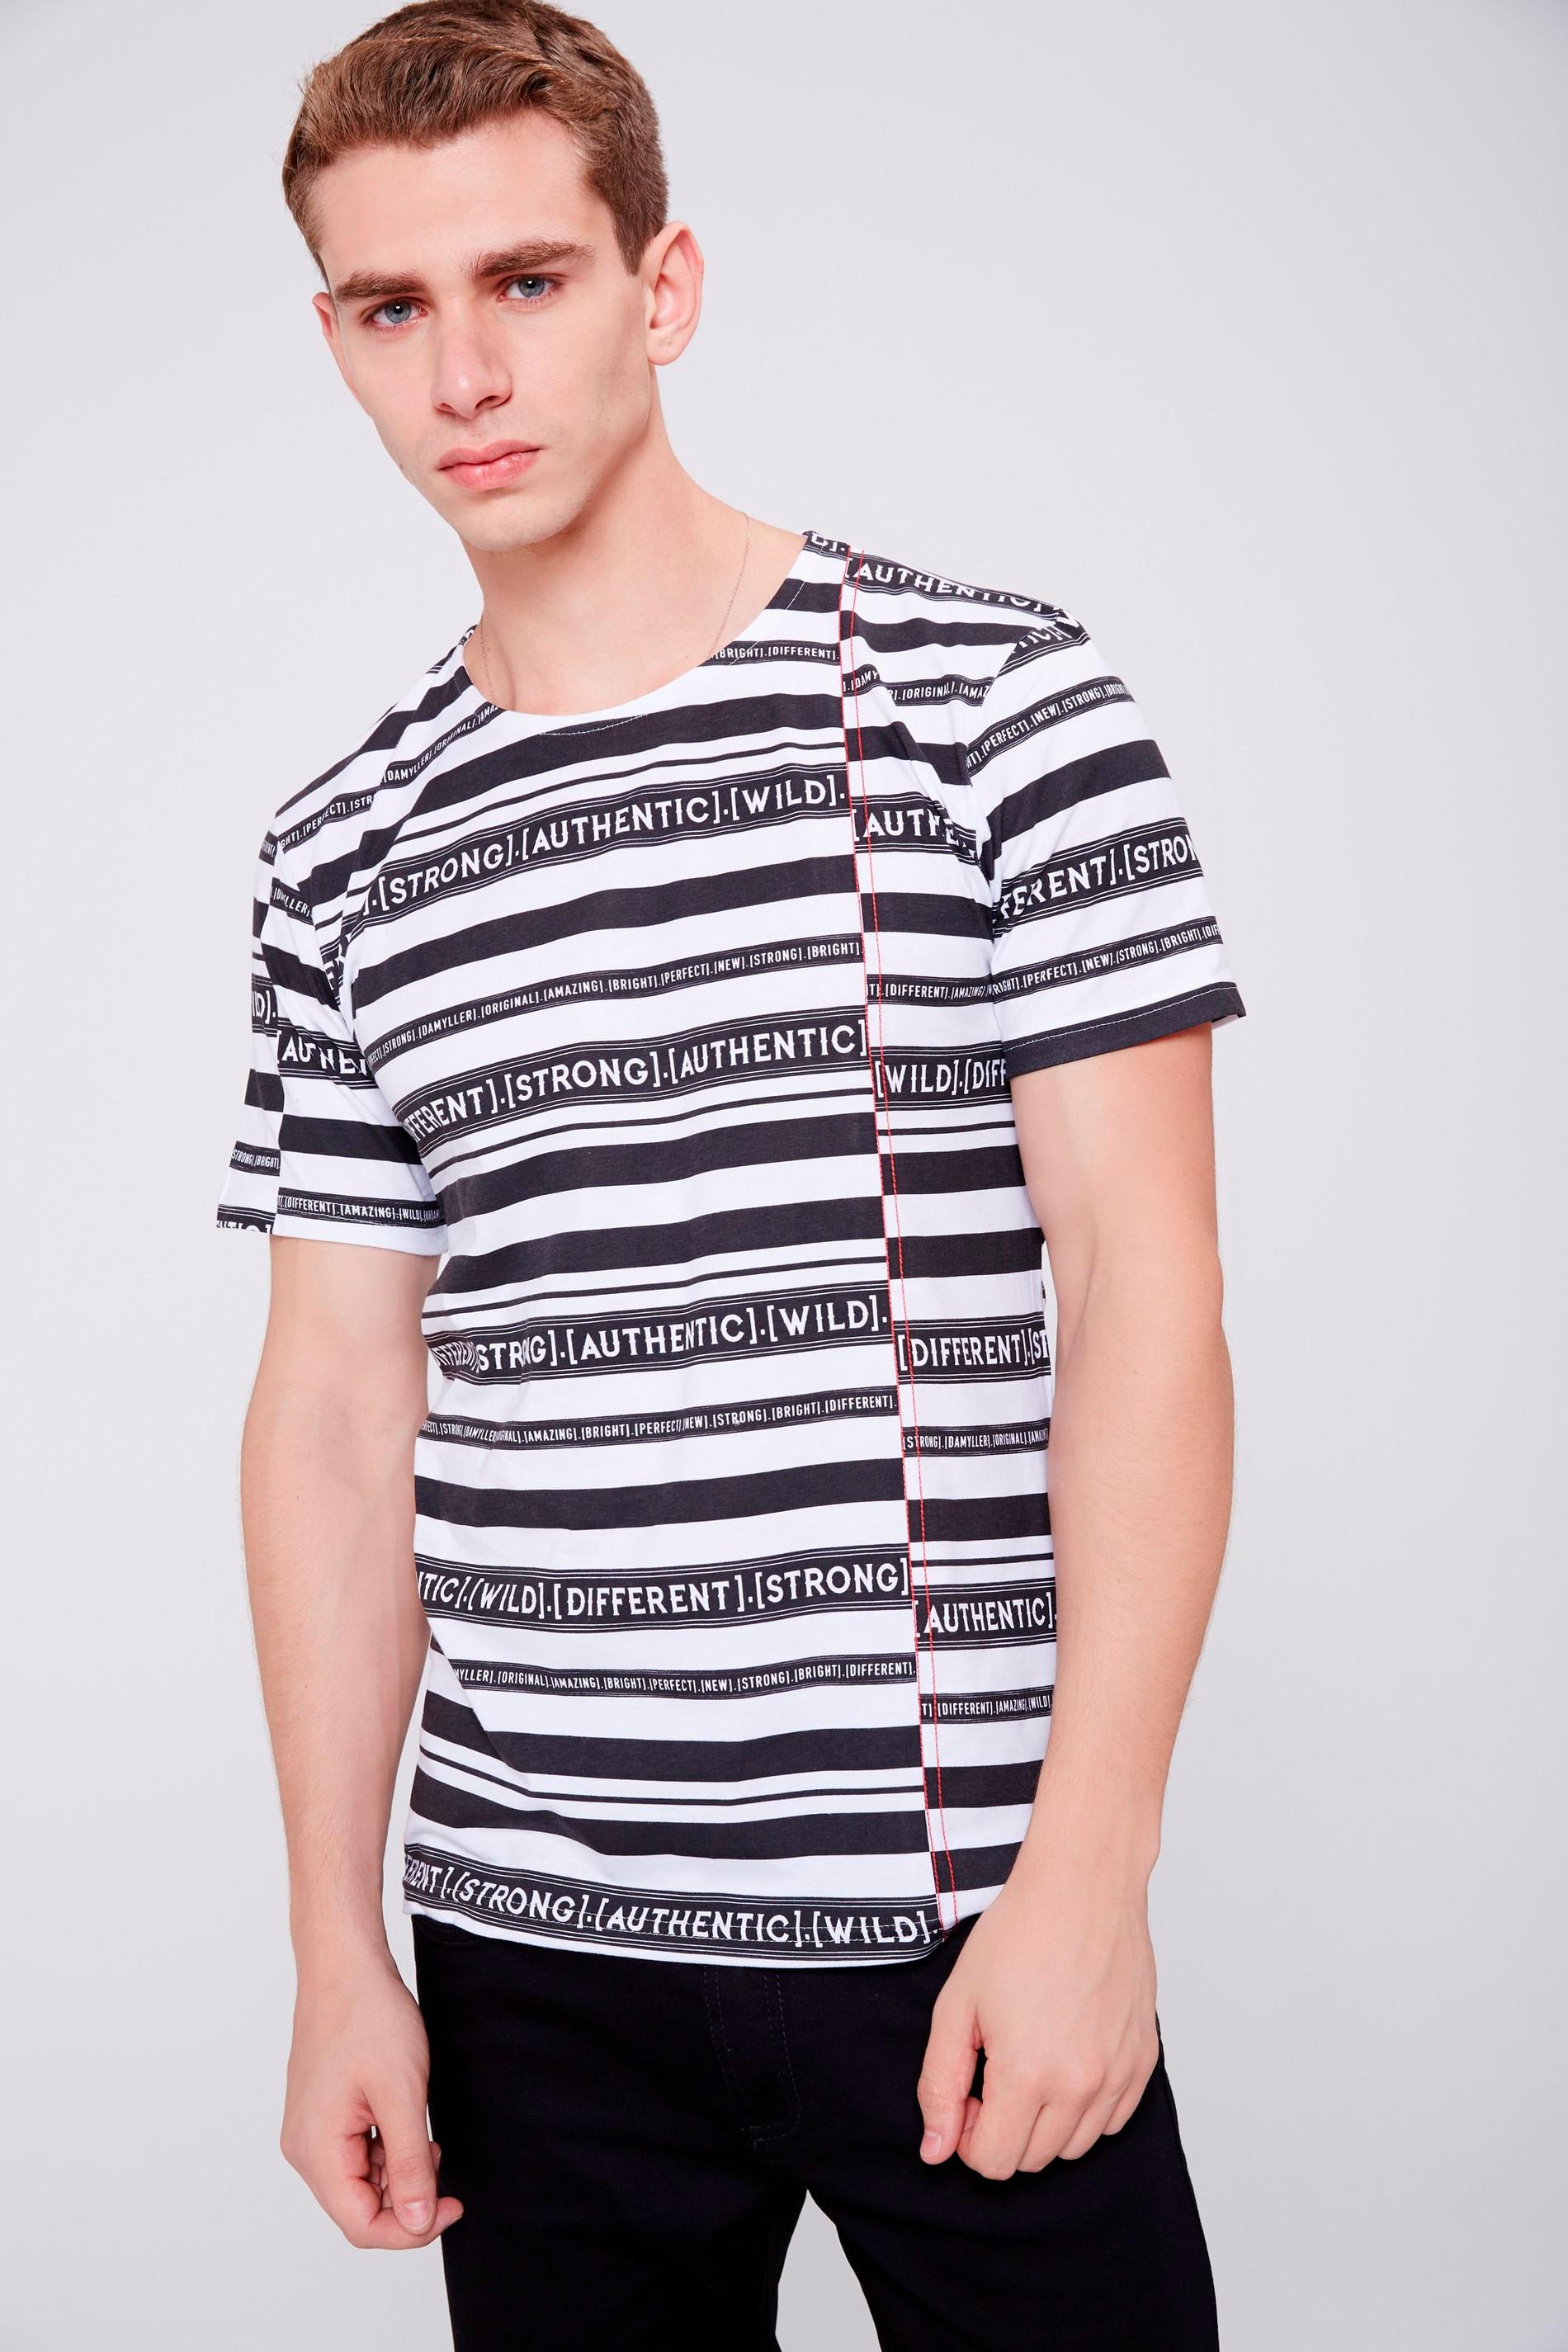 22c646732d Damyller · Moda Masculina · Camiseta · Fit. abrir abrir